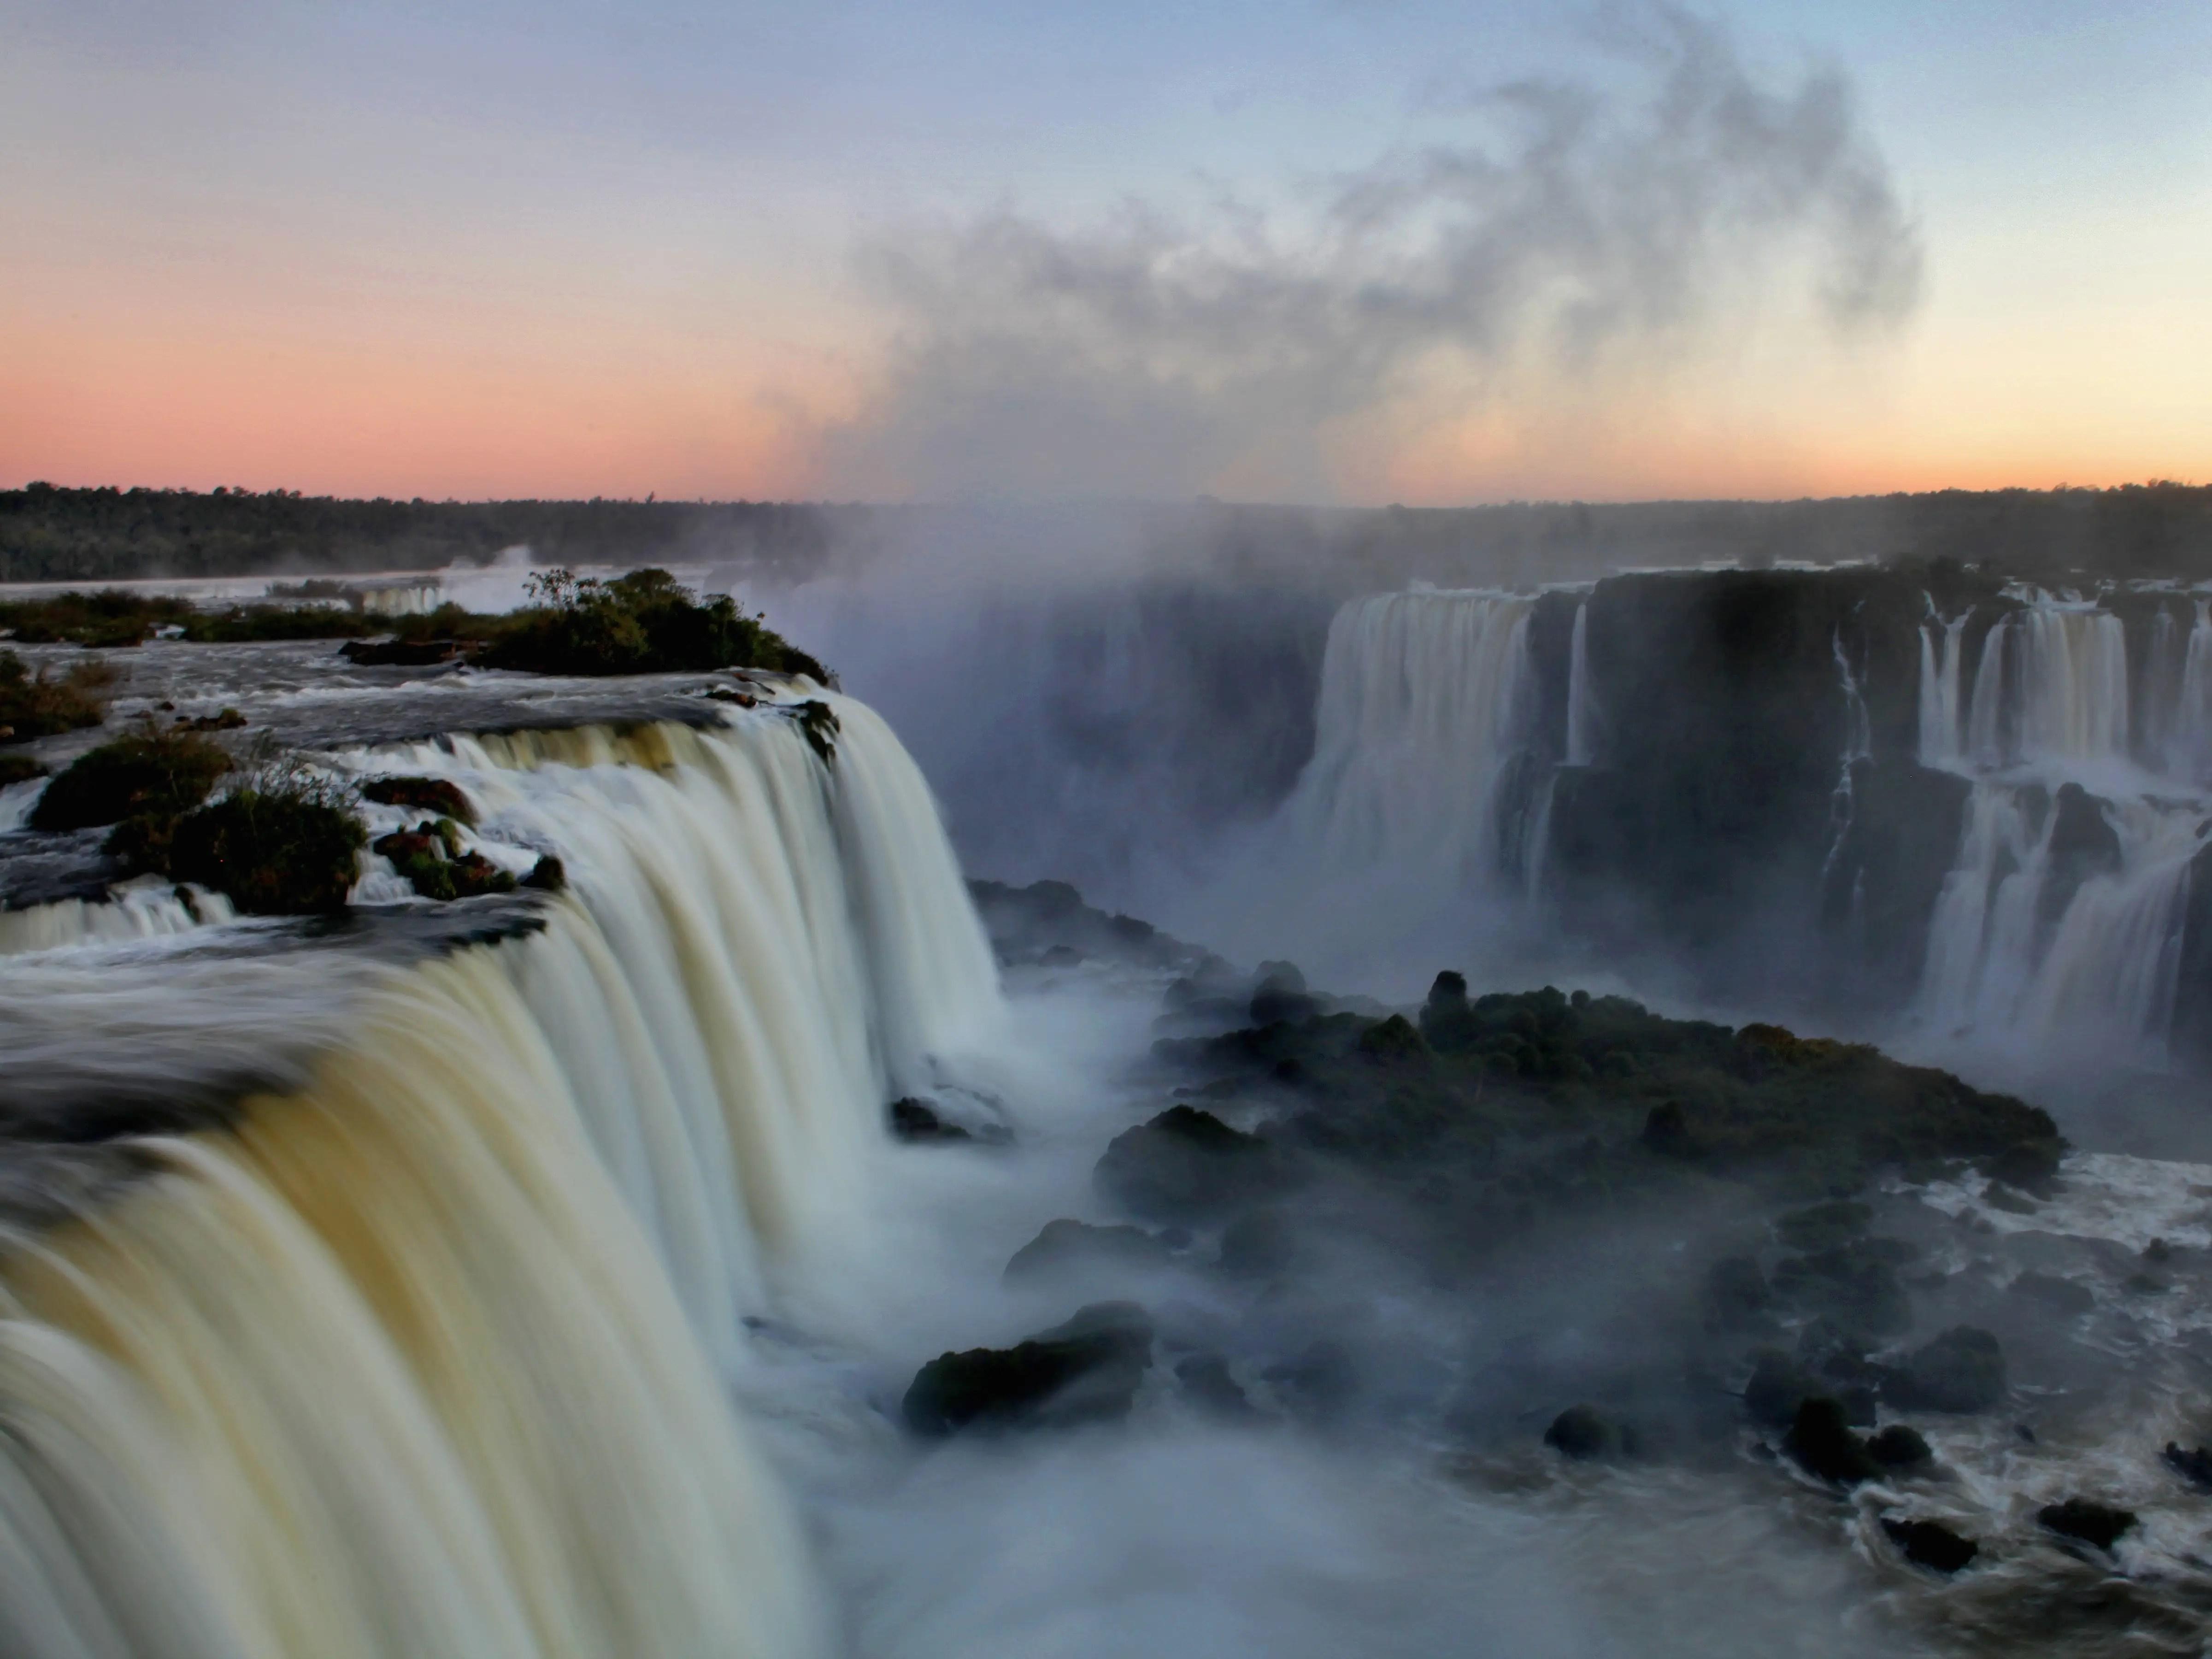 8.  Iguazú Falls, Brazil